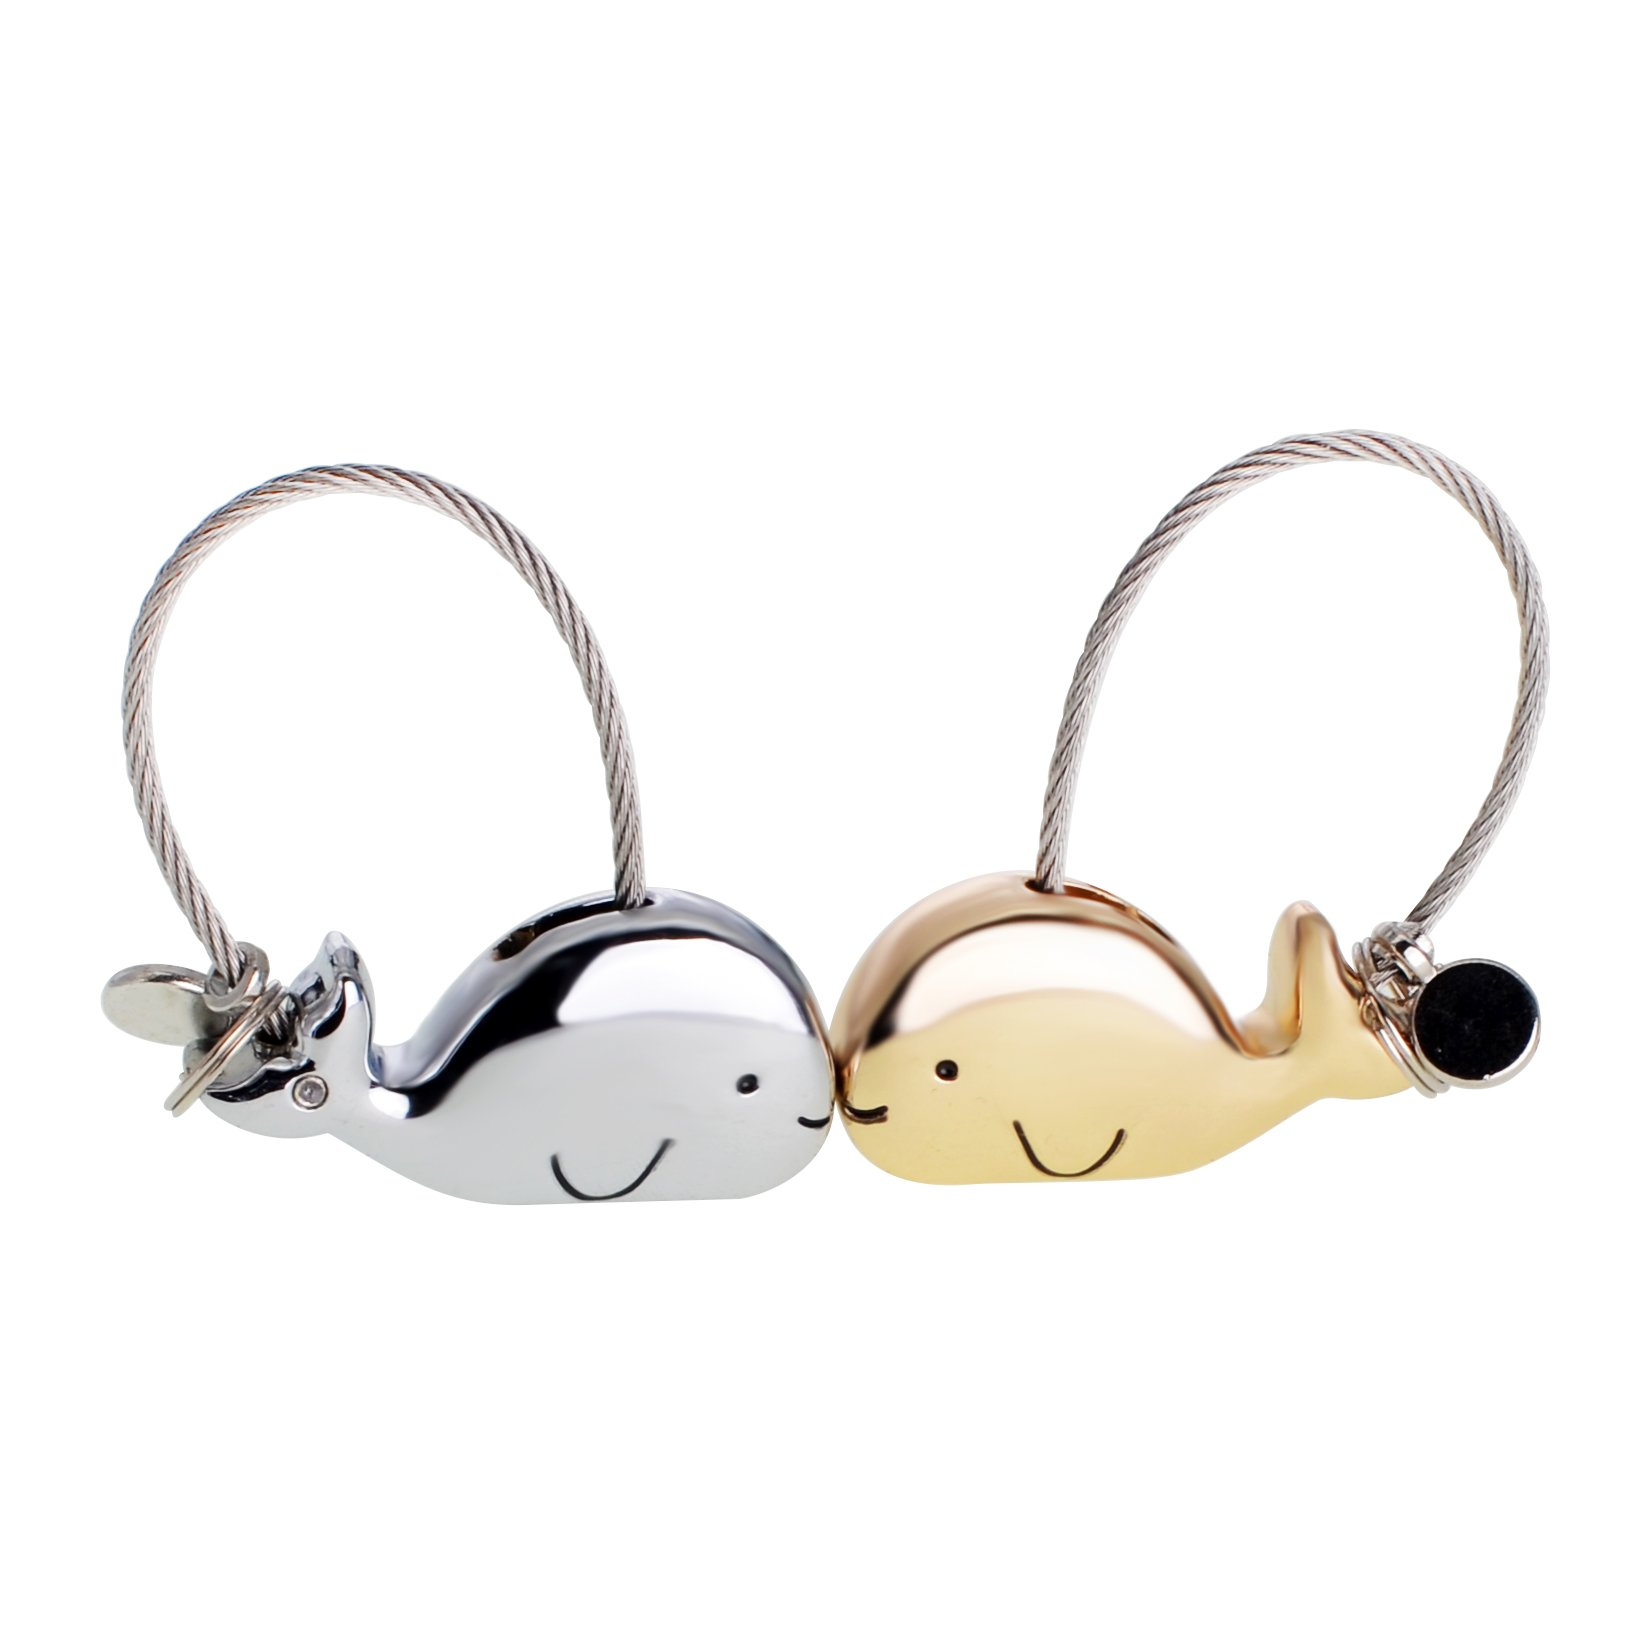 ASHMITA Cute Kiss Whale Couple Keychain for Women Charm Romantic Valentine Gift